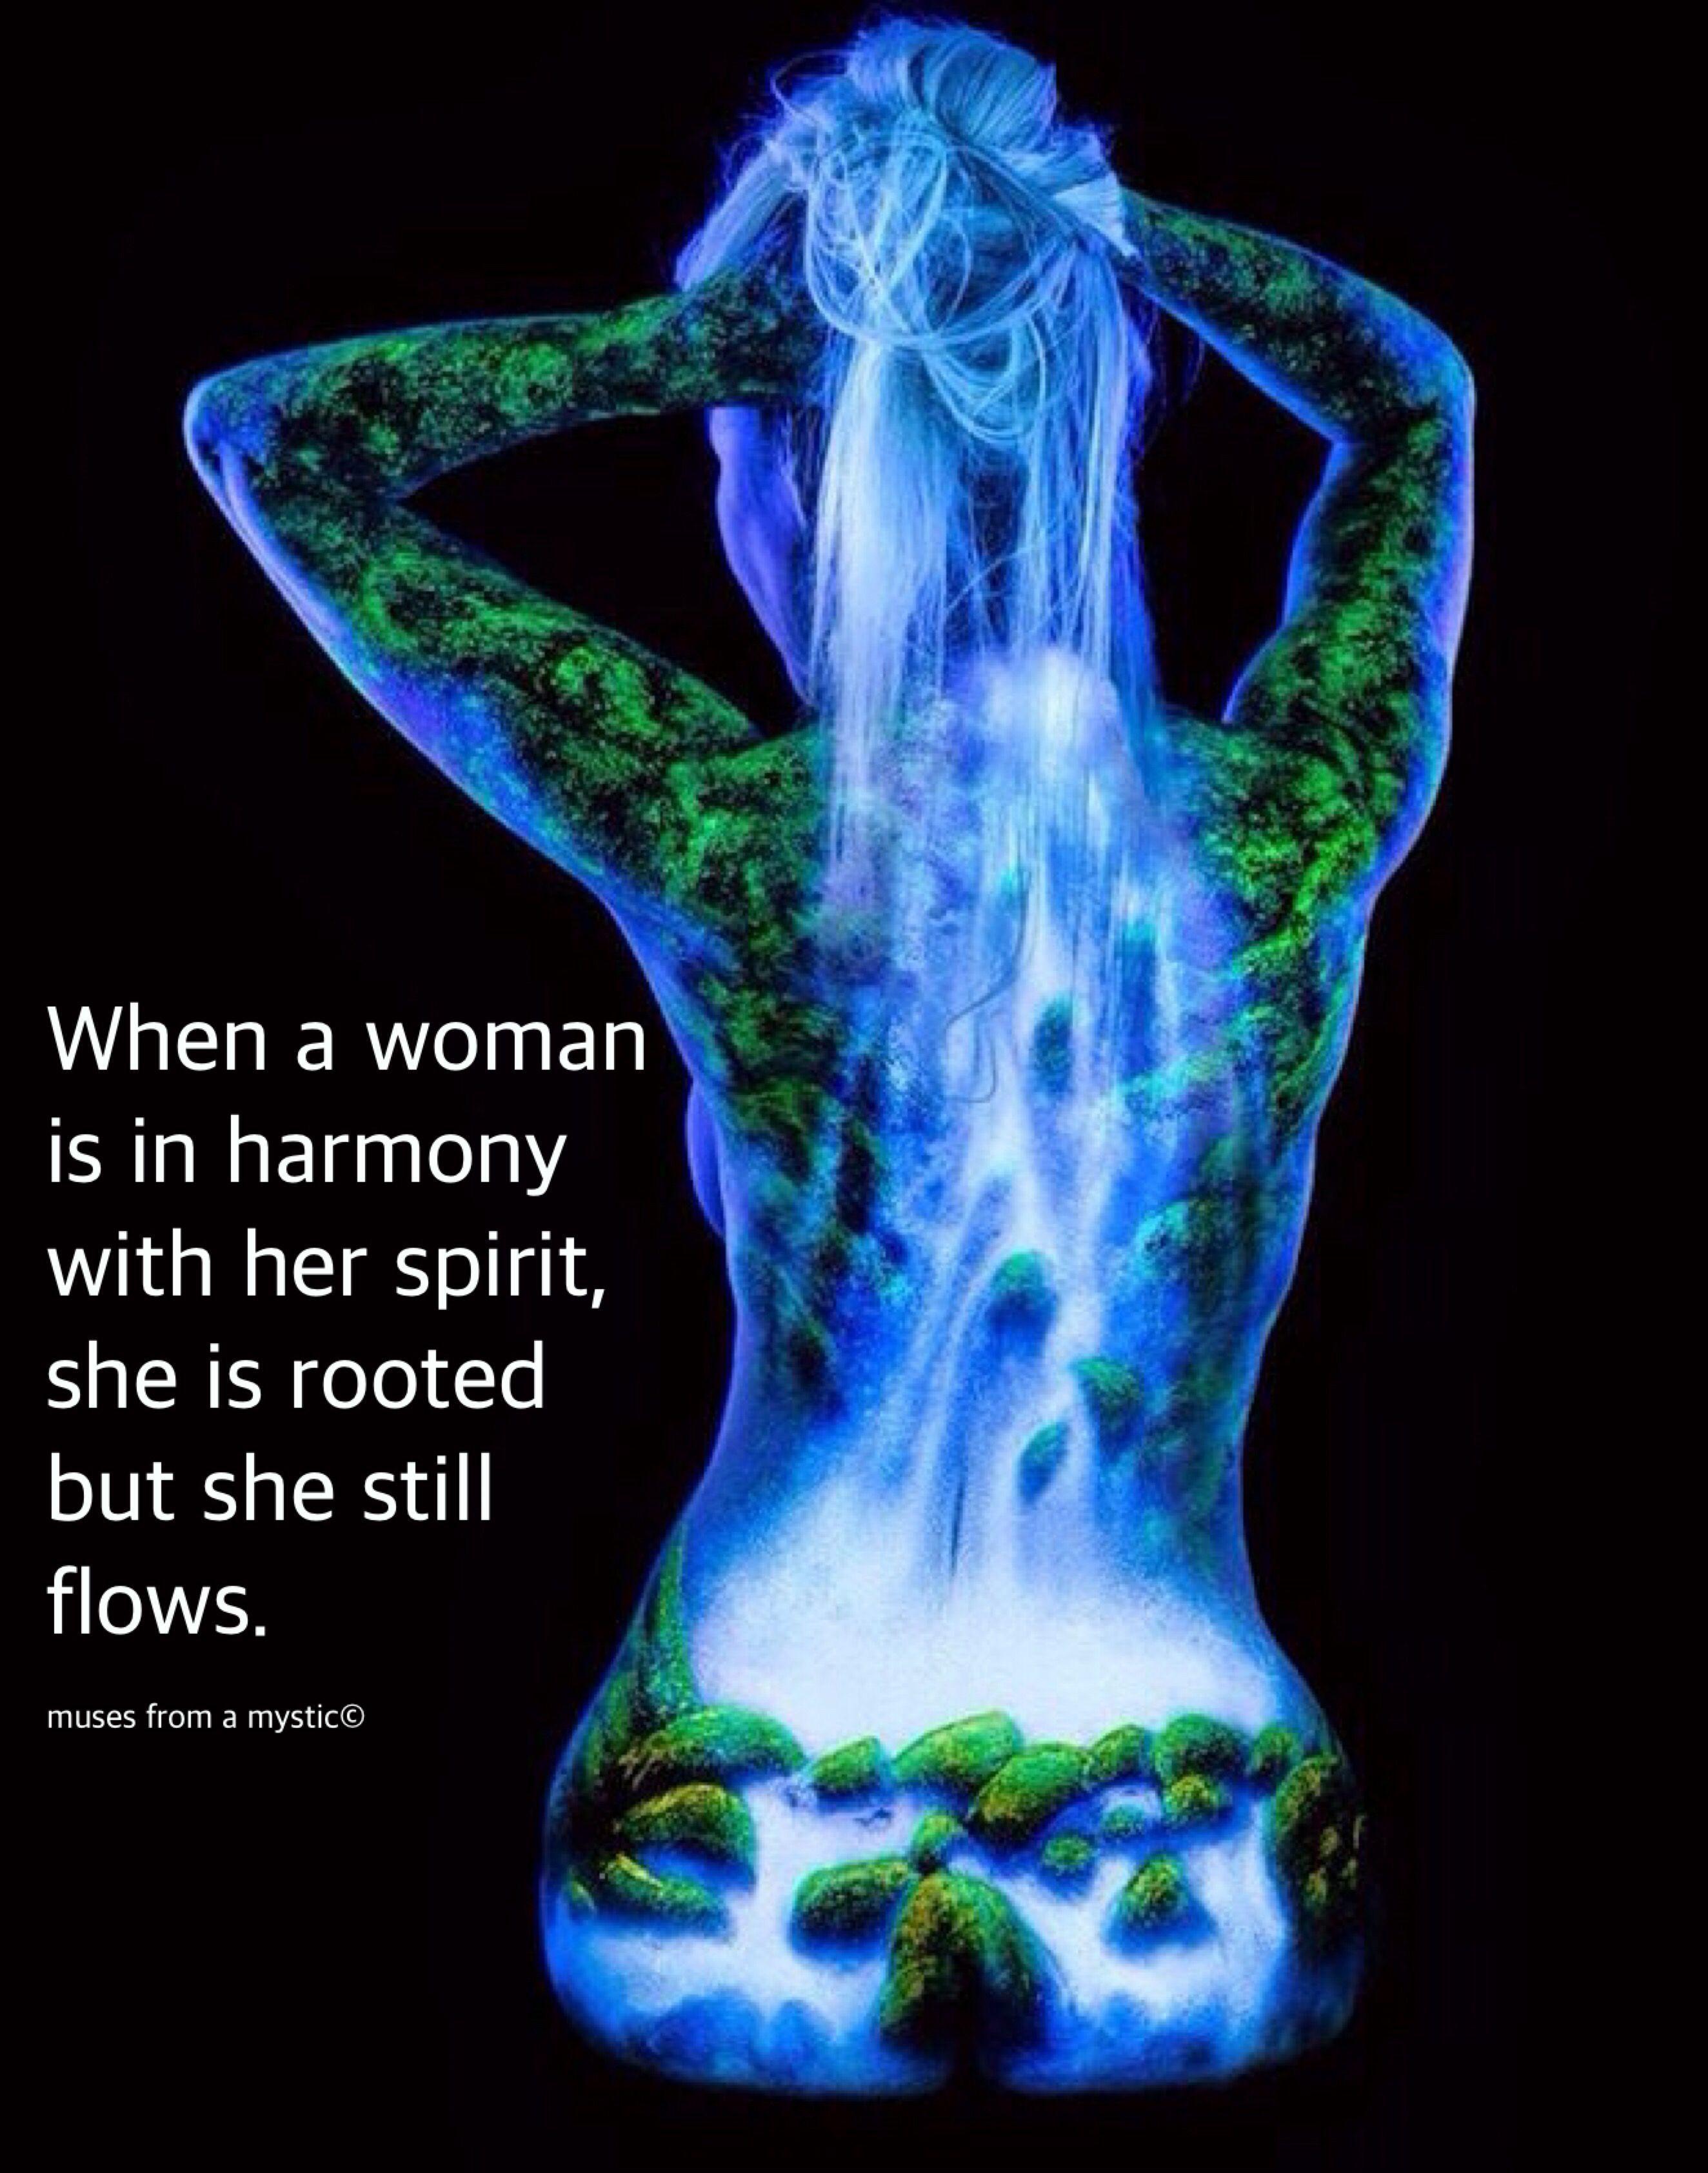 Pin By Deb Gimbel On Spirituality Quotes Body Art Photography Body Art Painting Waterfall Art